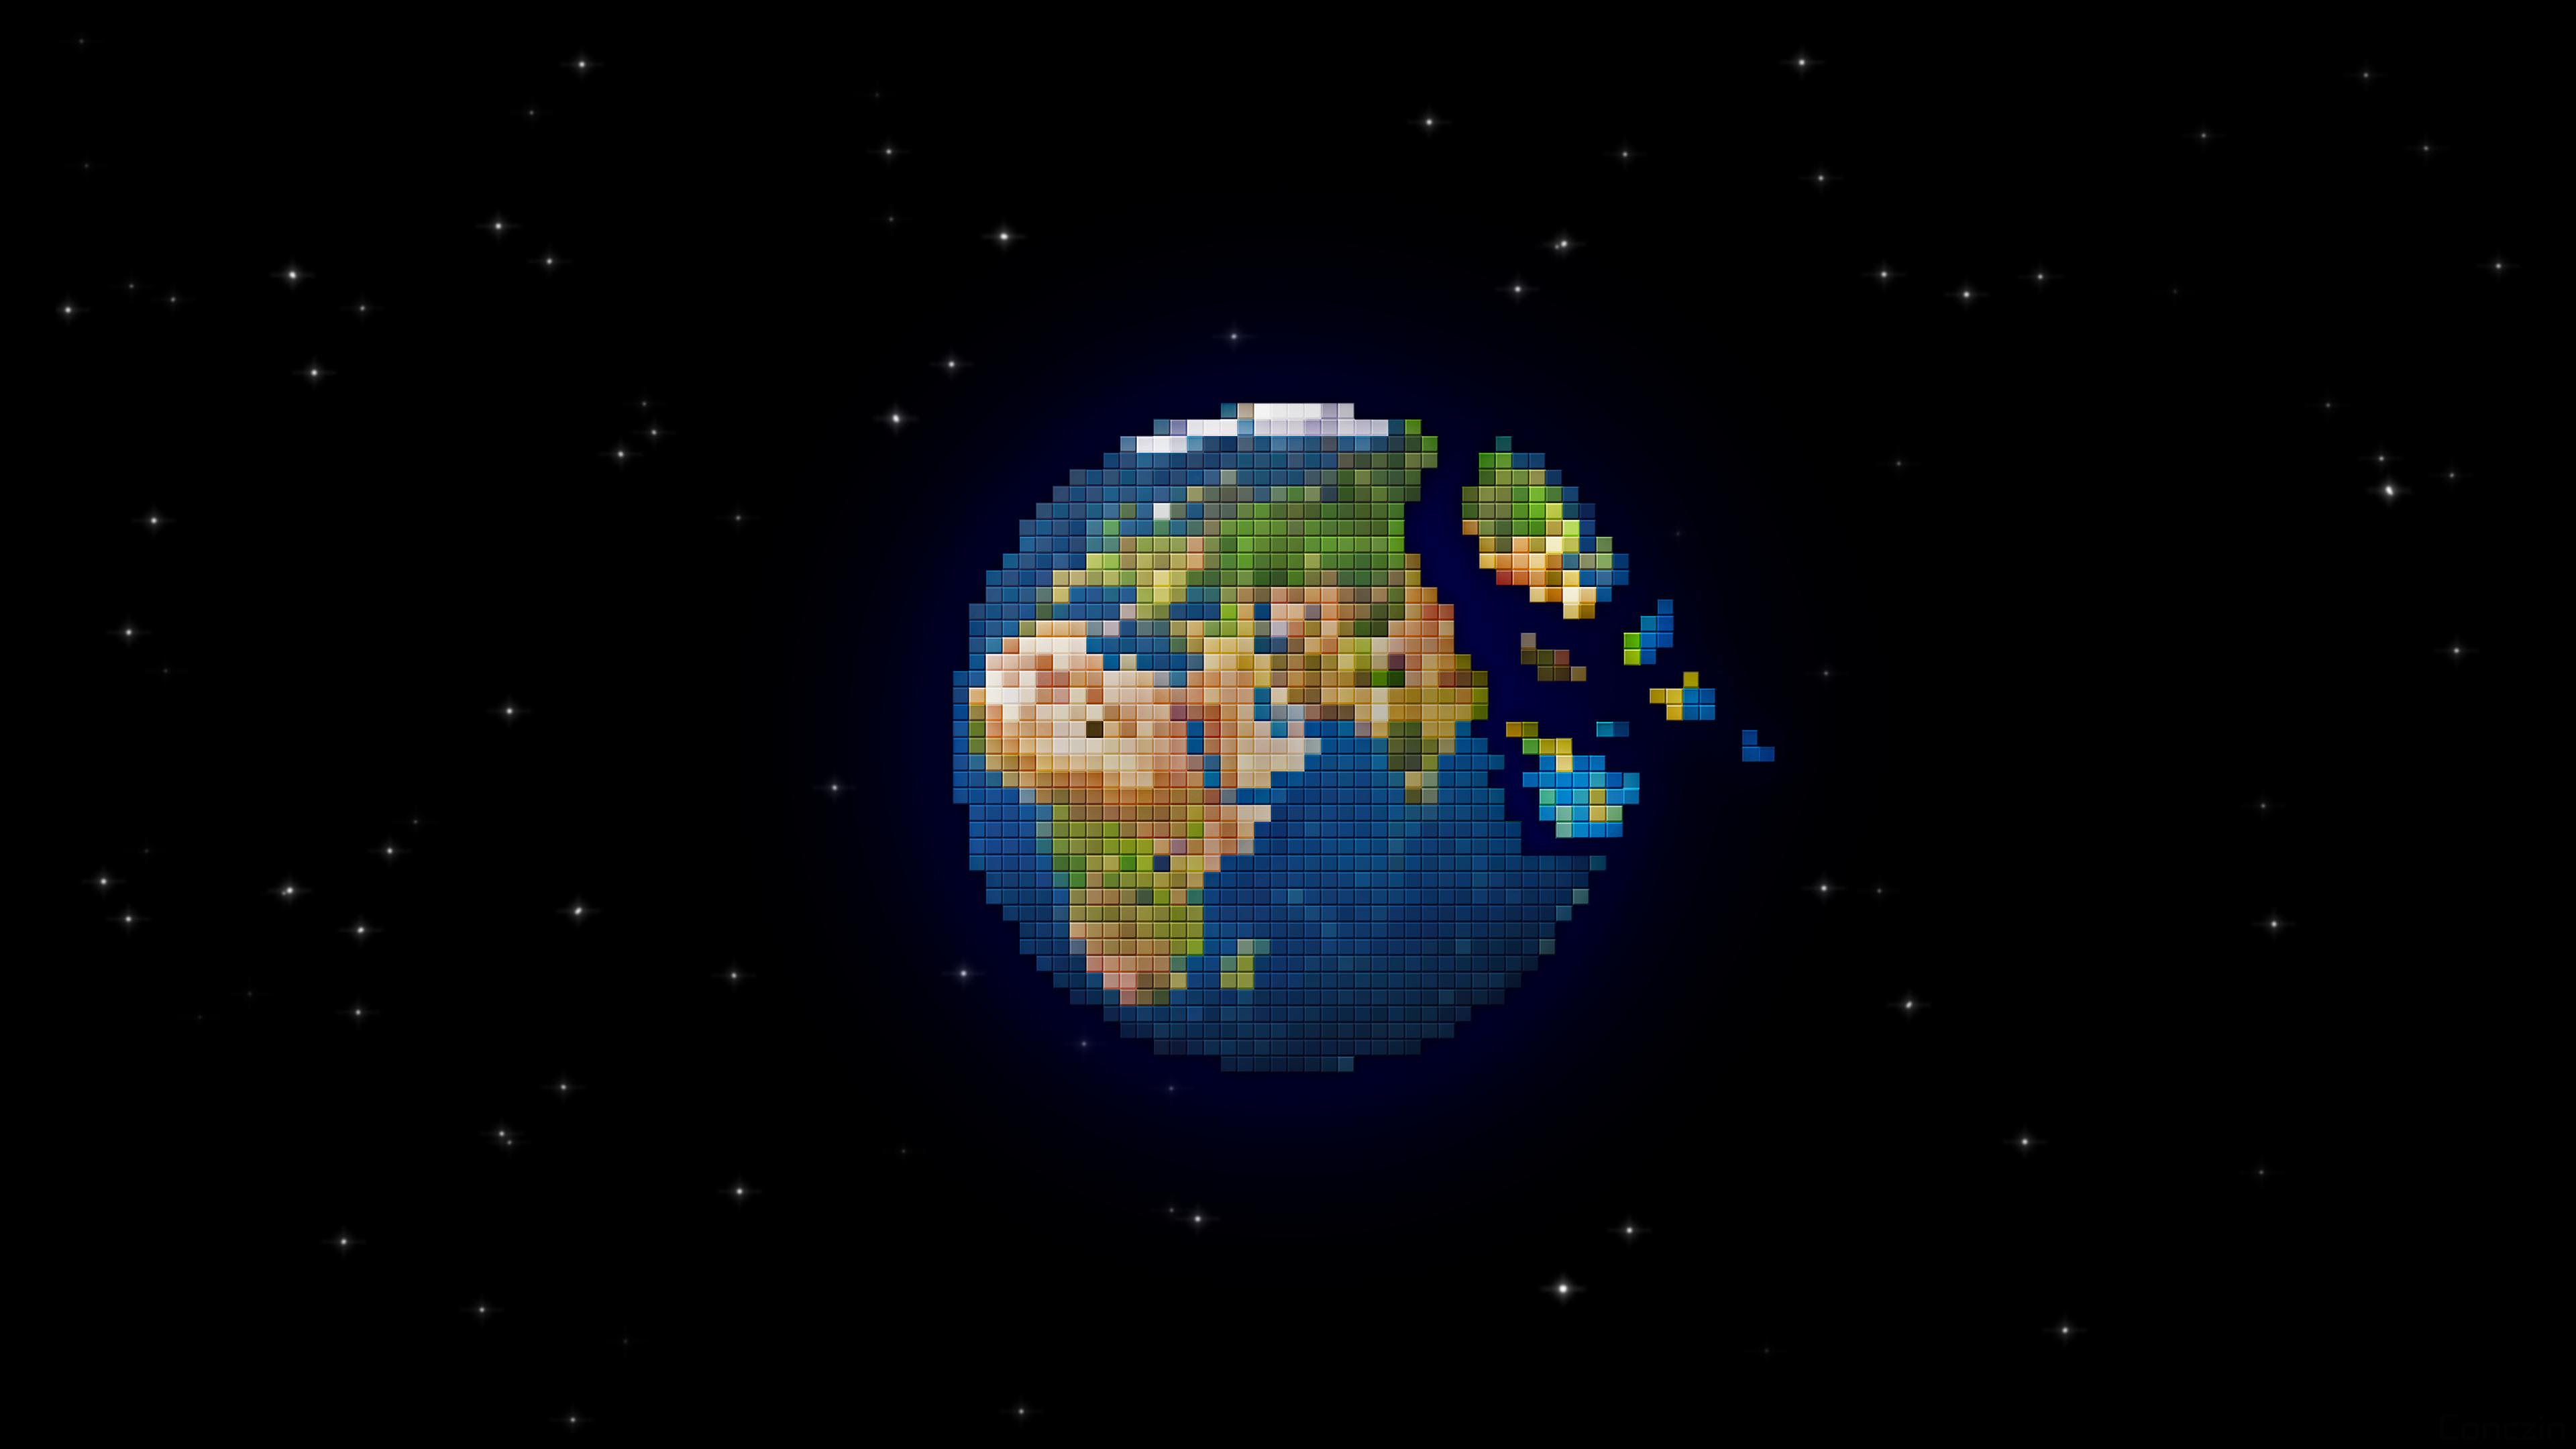 General 3840x2160 digital art space stars black Earth planet pixels pixel art pixelated simple background square minimalism